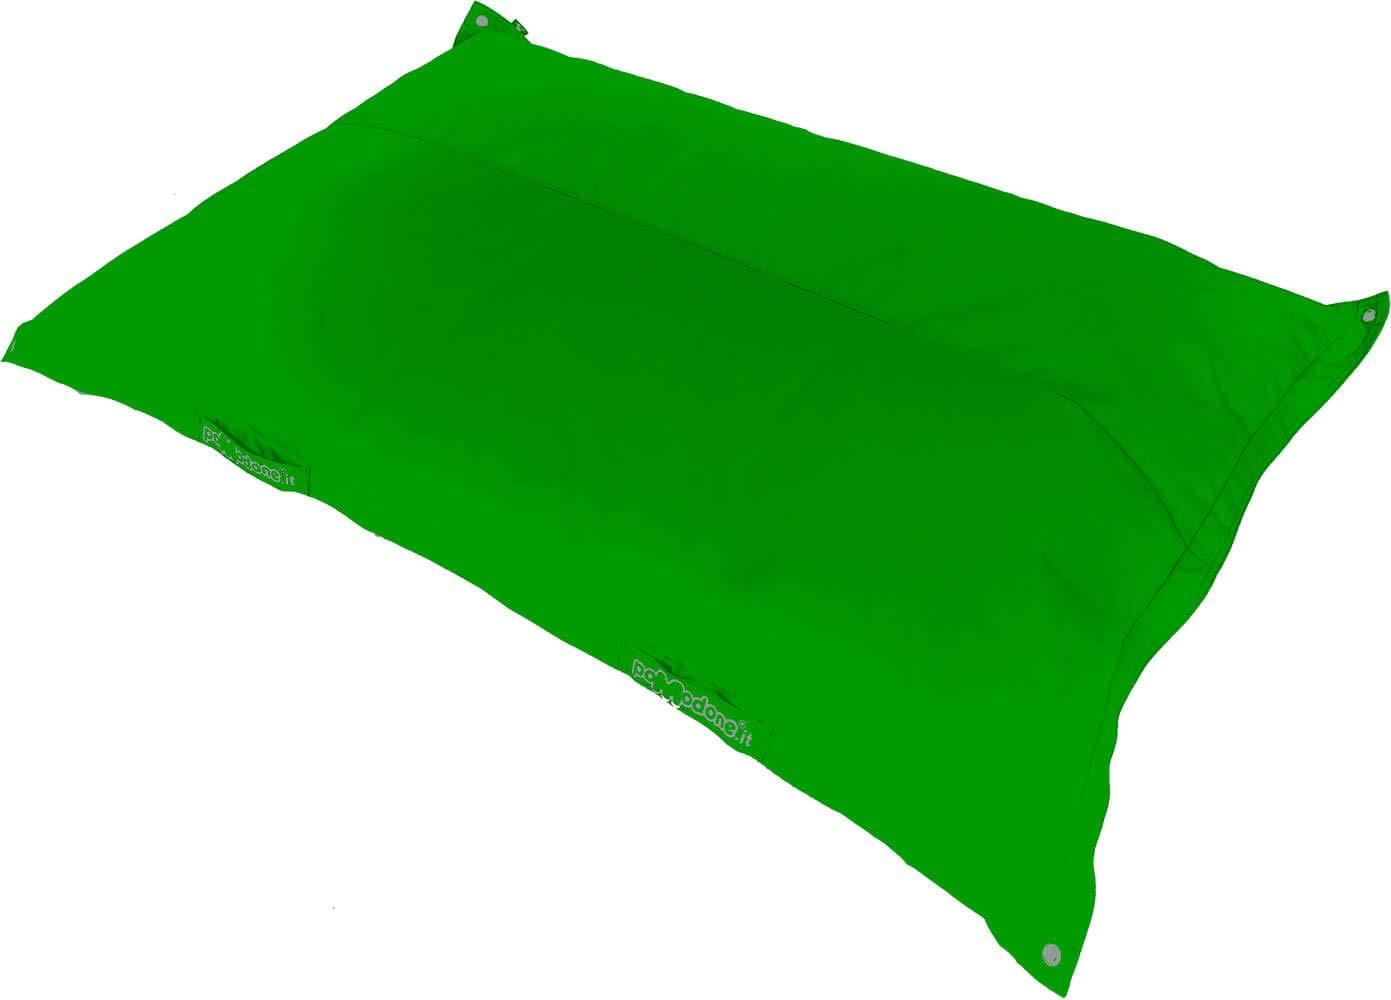 Cuscino Galleggiante 163x111cm in Tessuto Pomodone Galleggiante verde